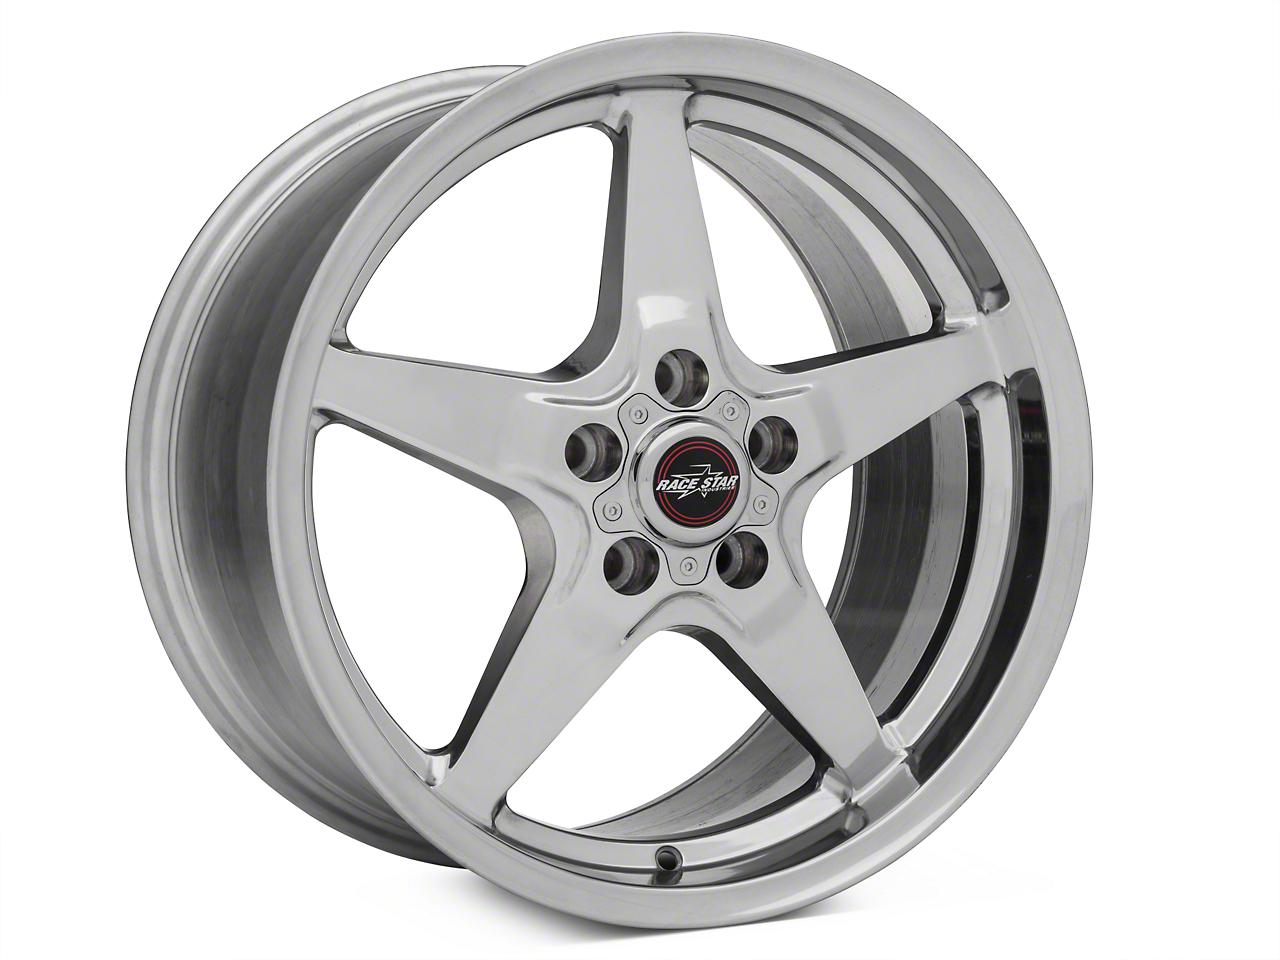 Race Star Drag Star Polished Wheel - Direct Drill - 18x10.5 (05-14 All)